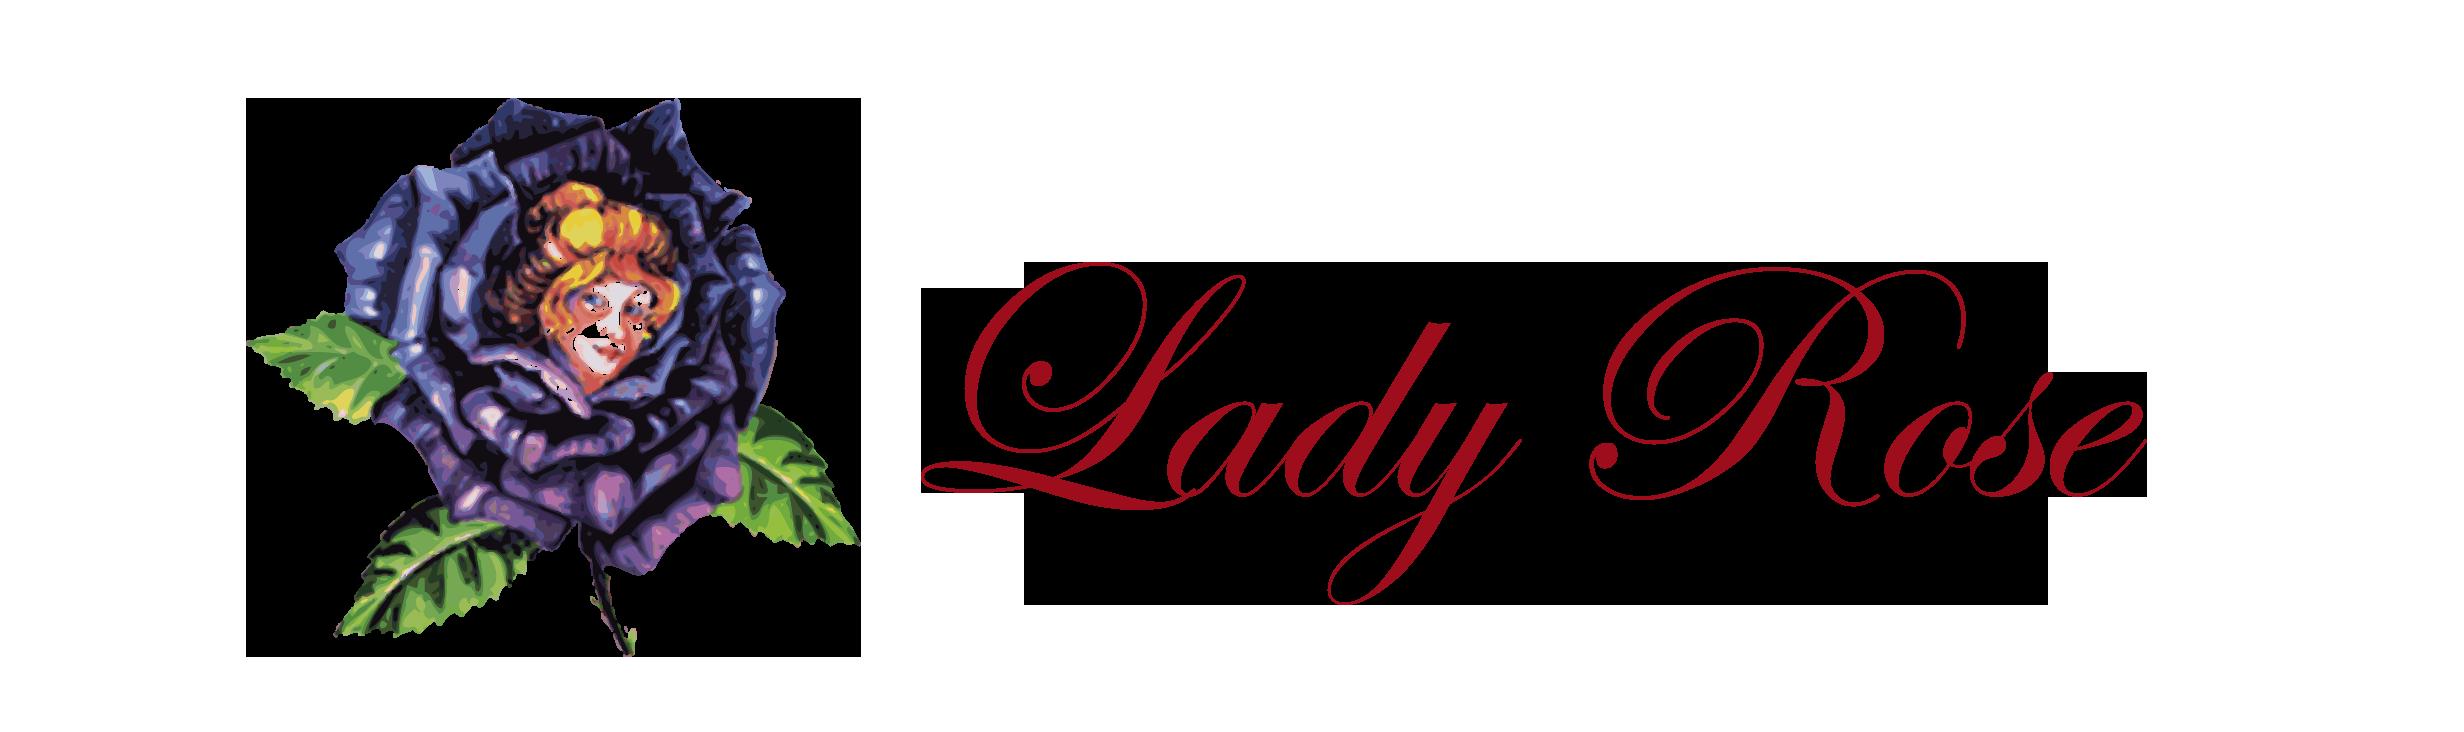 Ristorante Lady Rose